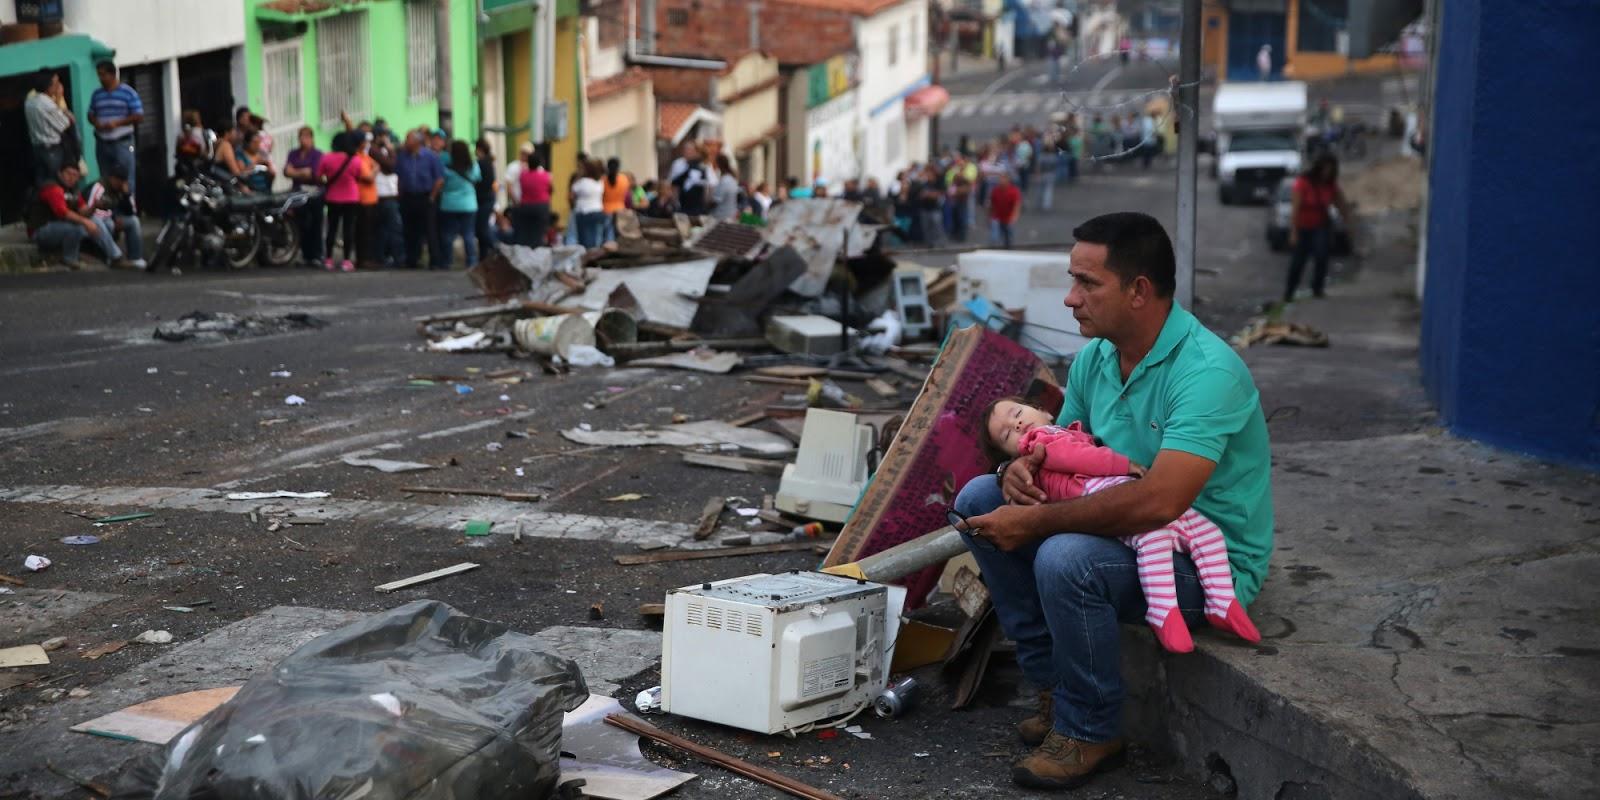 http://www.libertar.in/2016/04/tirania-comunista-na-venezuela-usa.html?utm_source=feedburner&utm_medium=email&utm_campaign=Feed%3A+LibertarinSejaLivreAntesQueSejaTarde+%28LIBERTAR.in+%3A%3A+Seja+livre%2C+antes+que+seja+tarde!%29